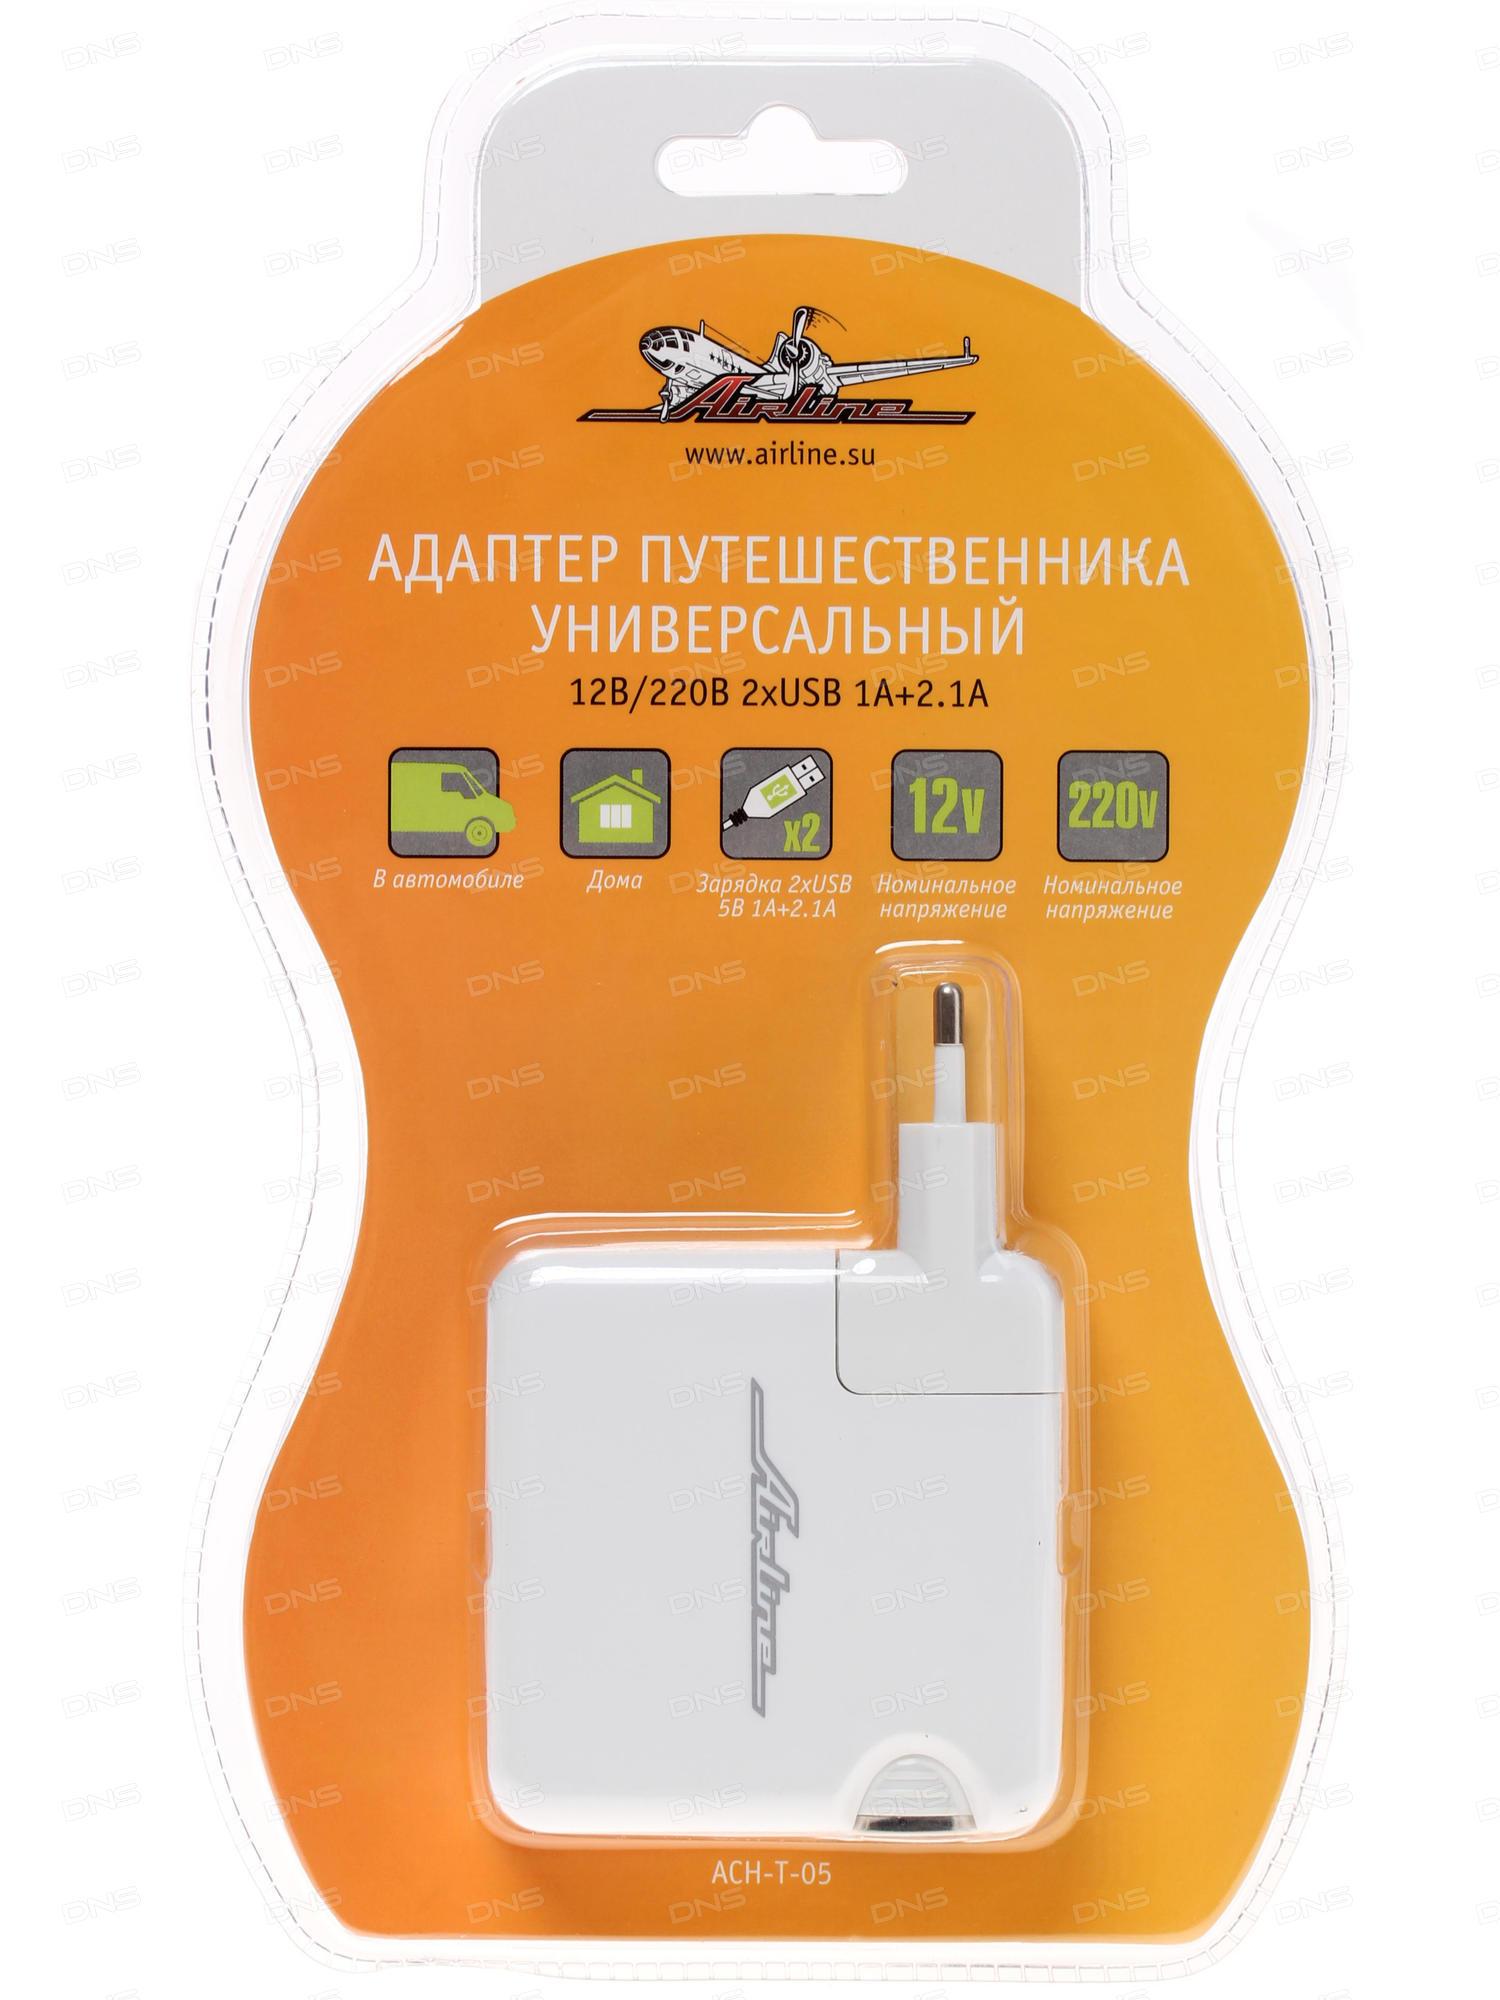 Адаптер 12/24 В USB 2 входа путешественника Airline ACH-T-05